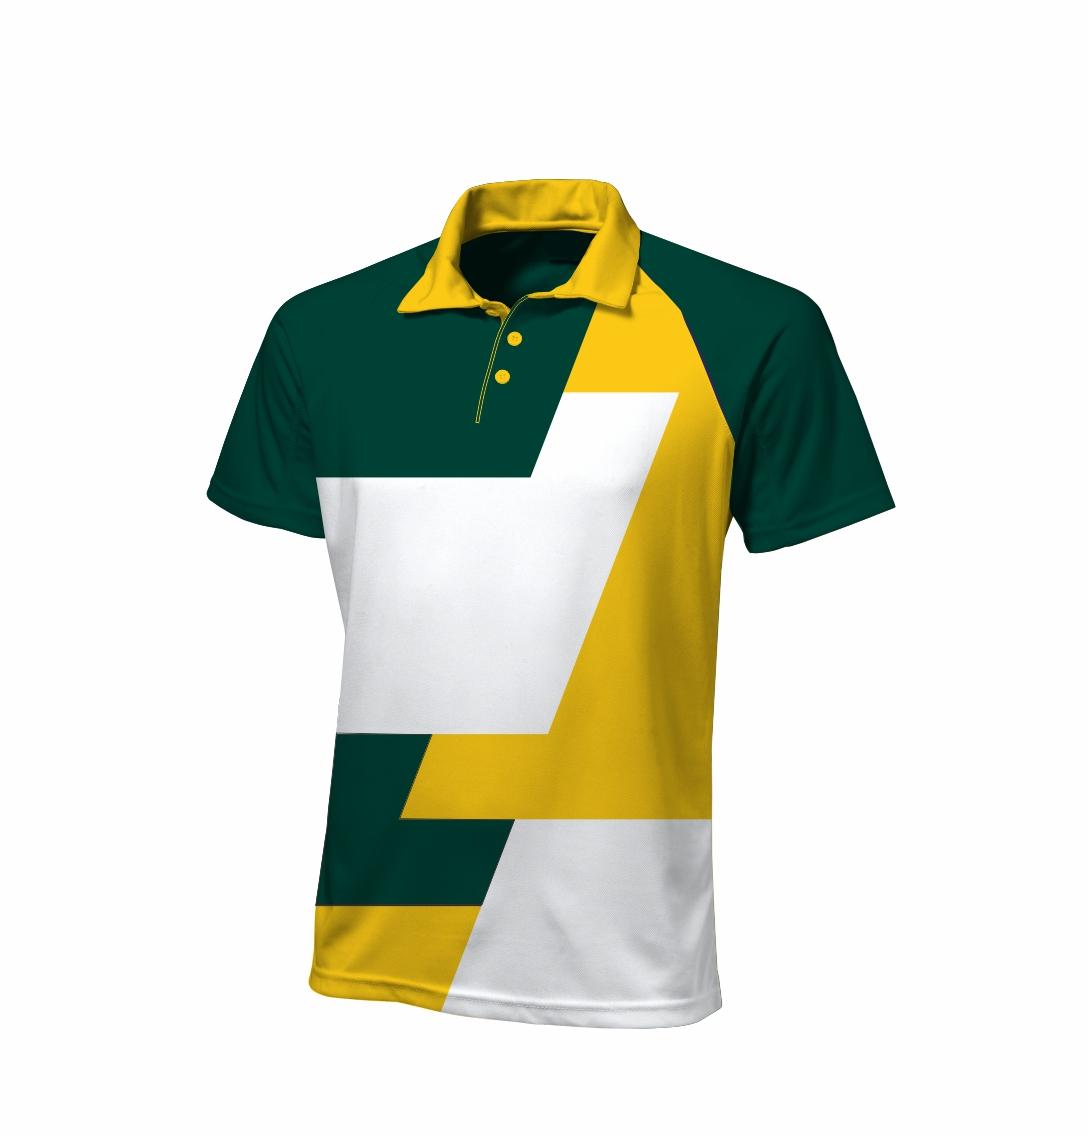 Sublimated Zuco golfer - De Stijl